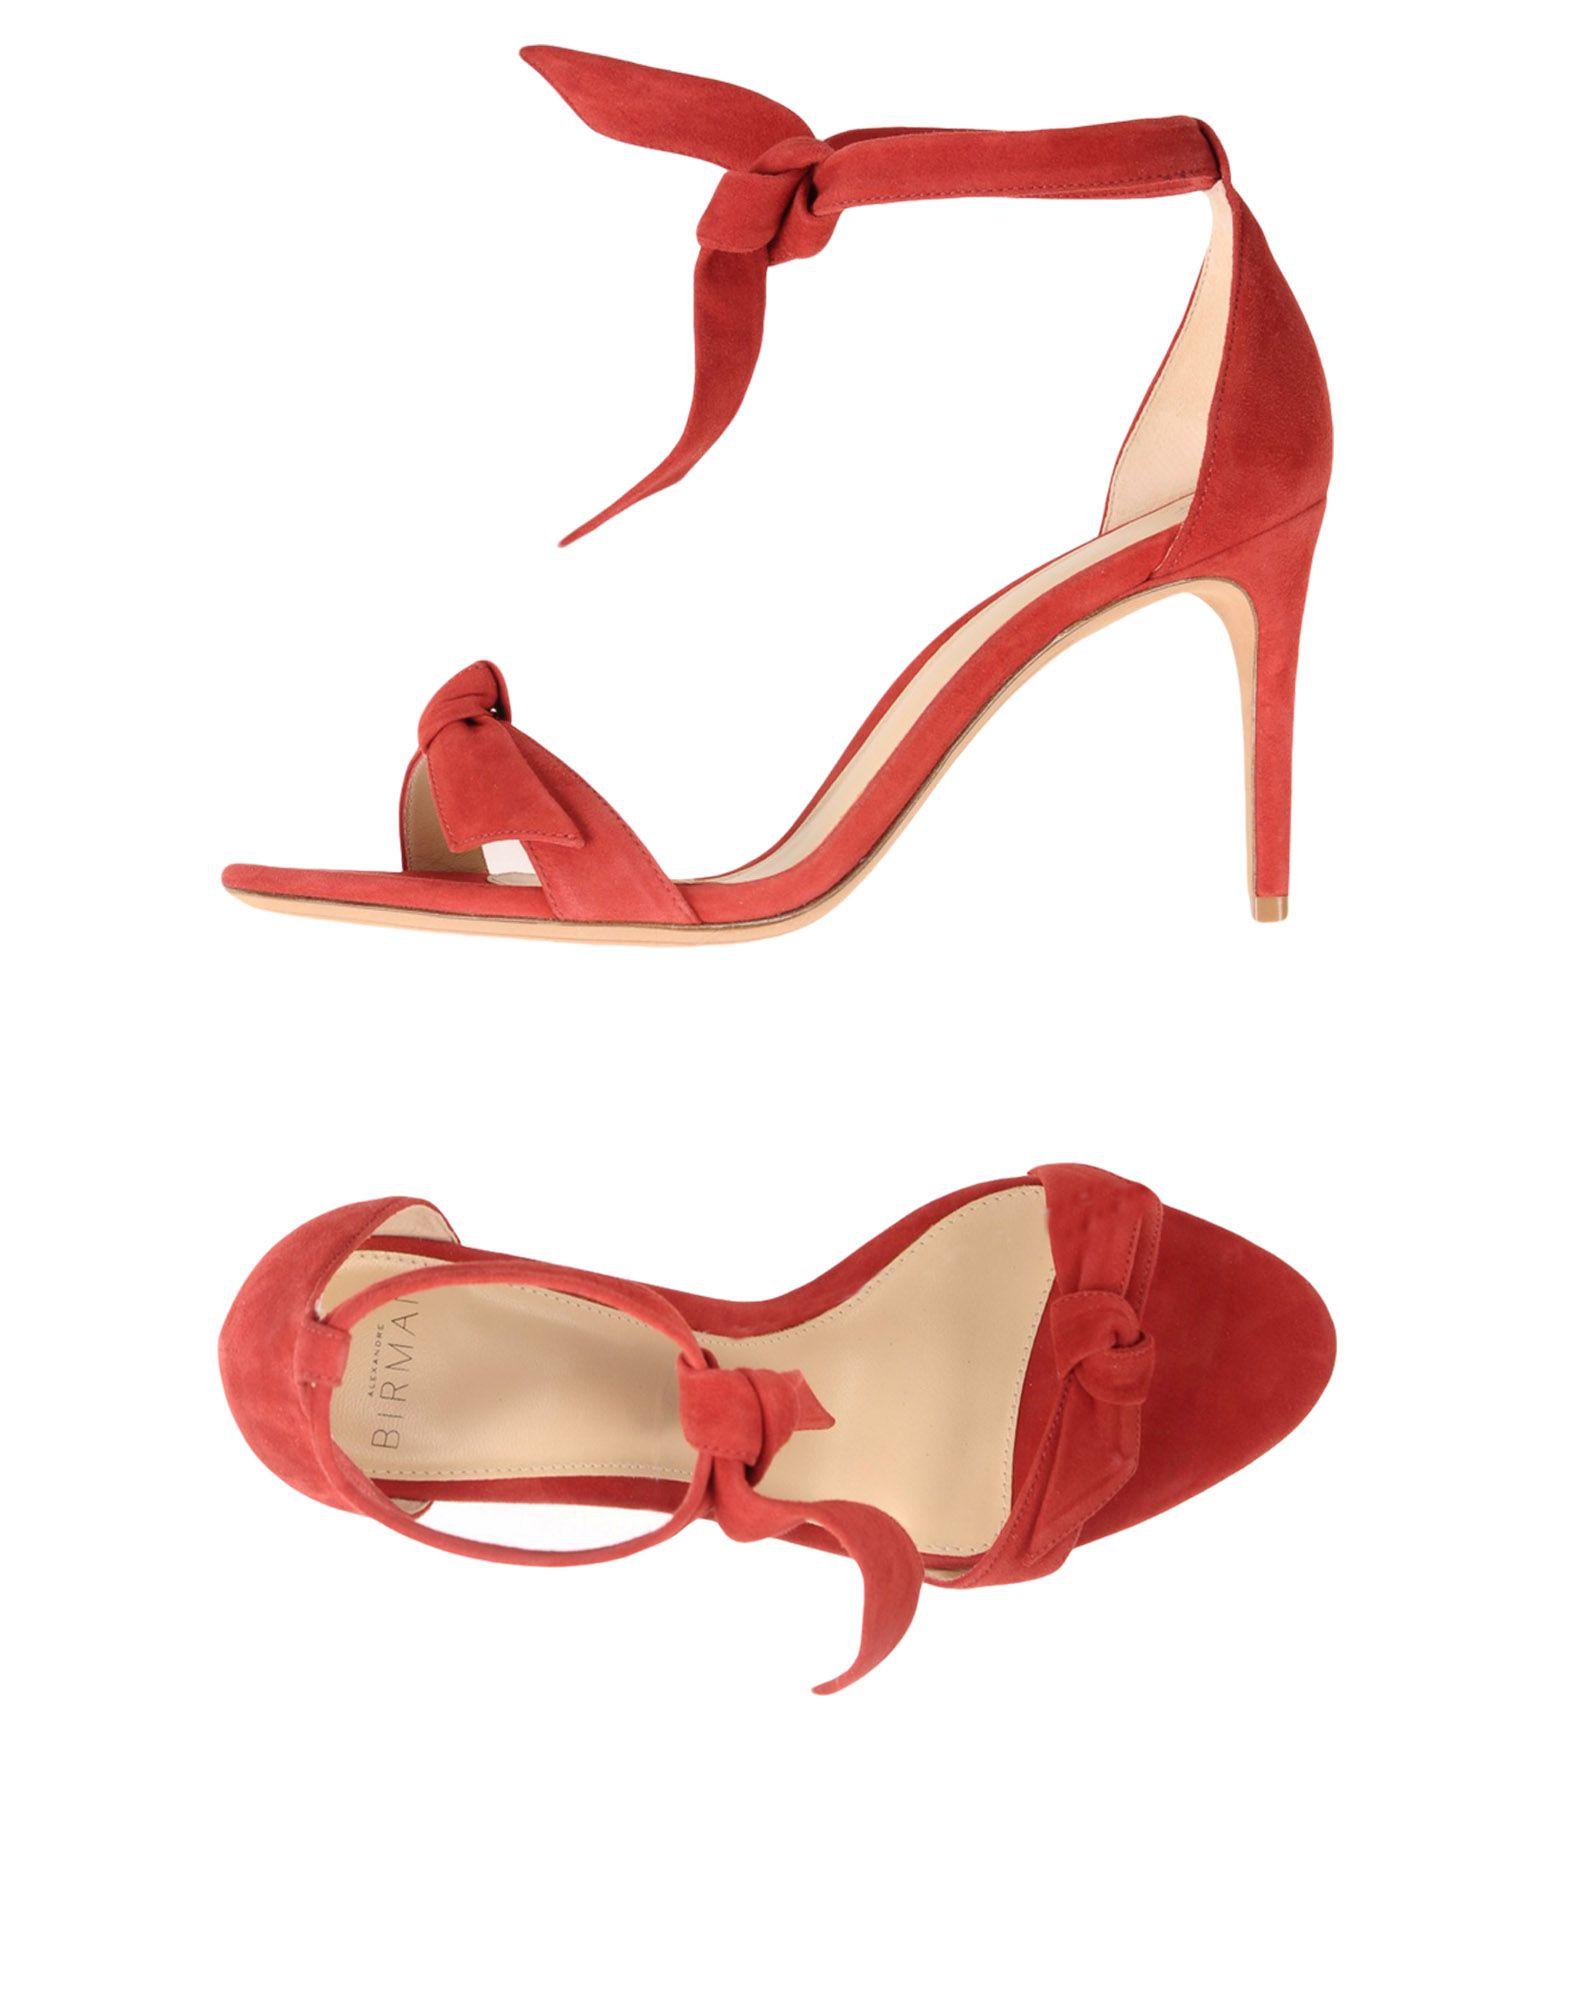 Sandales Alexandre Birman Femme - Sandales Alexandre Birman sur